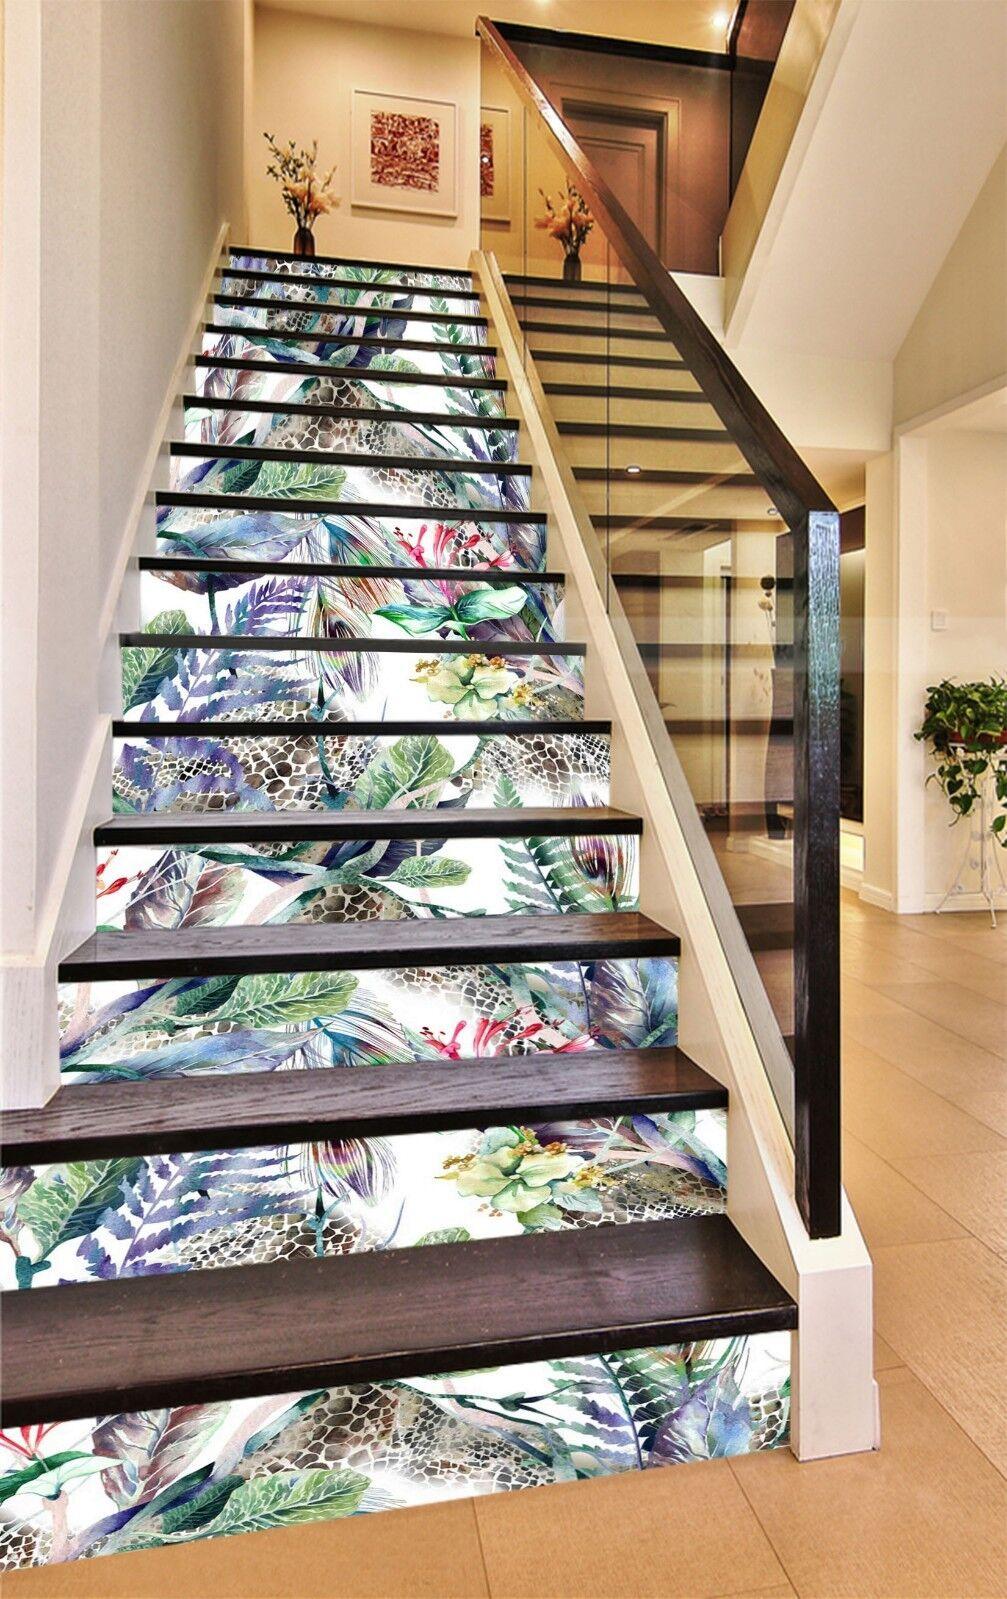 3D ColGoldt leaves Stair Risers Decoration Photo Mural Vinyl Decal Wallpaper AU